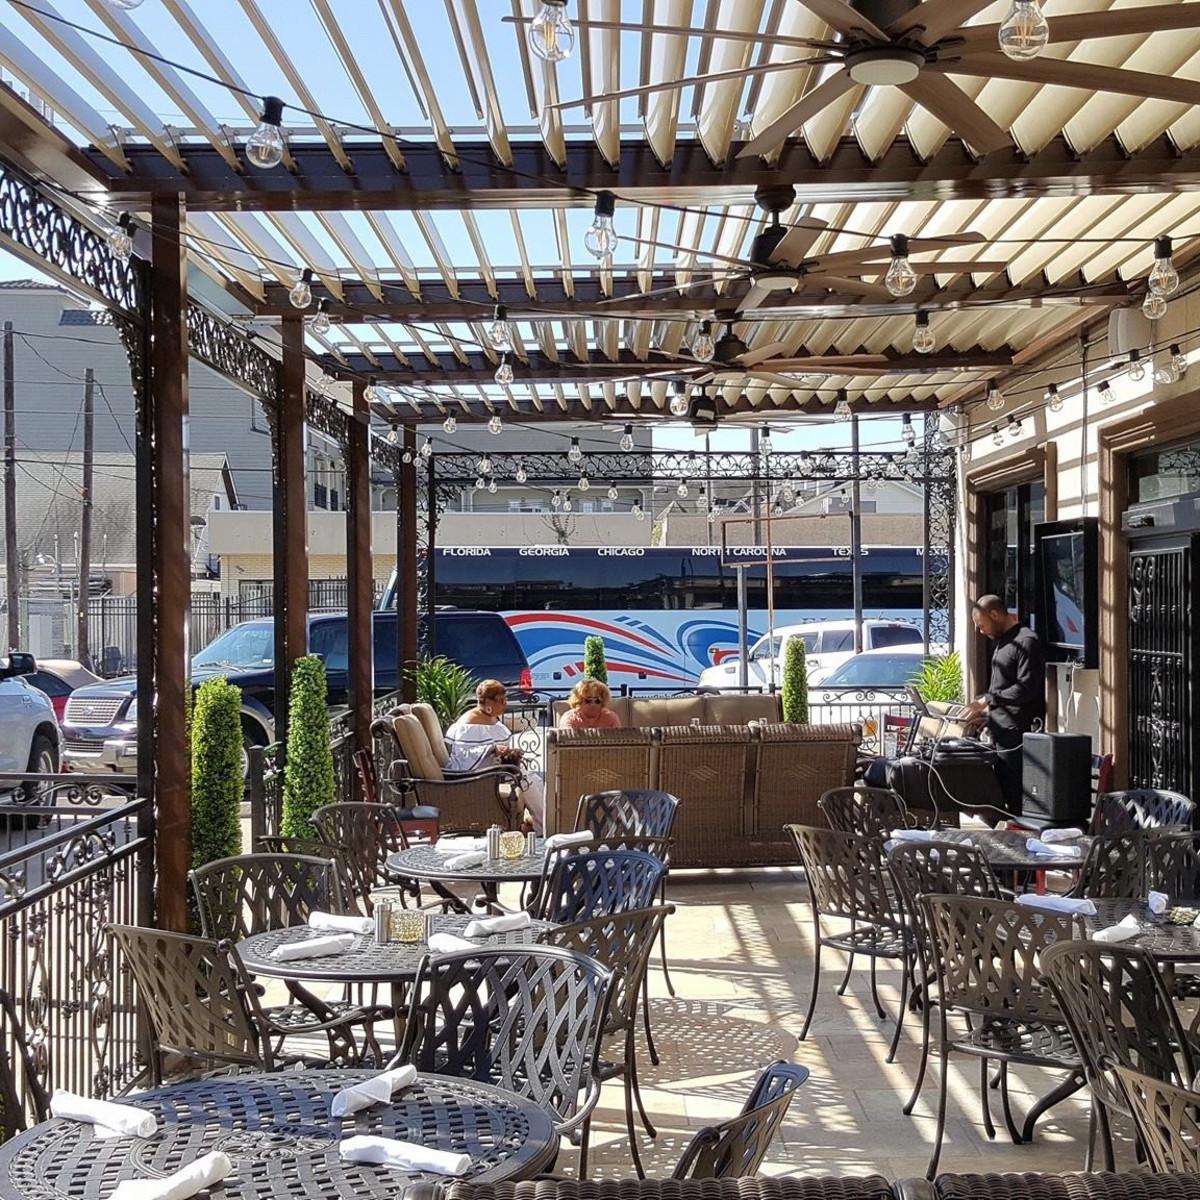 Phil and Derek's Restaurant and Jazz Bar patio